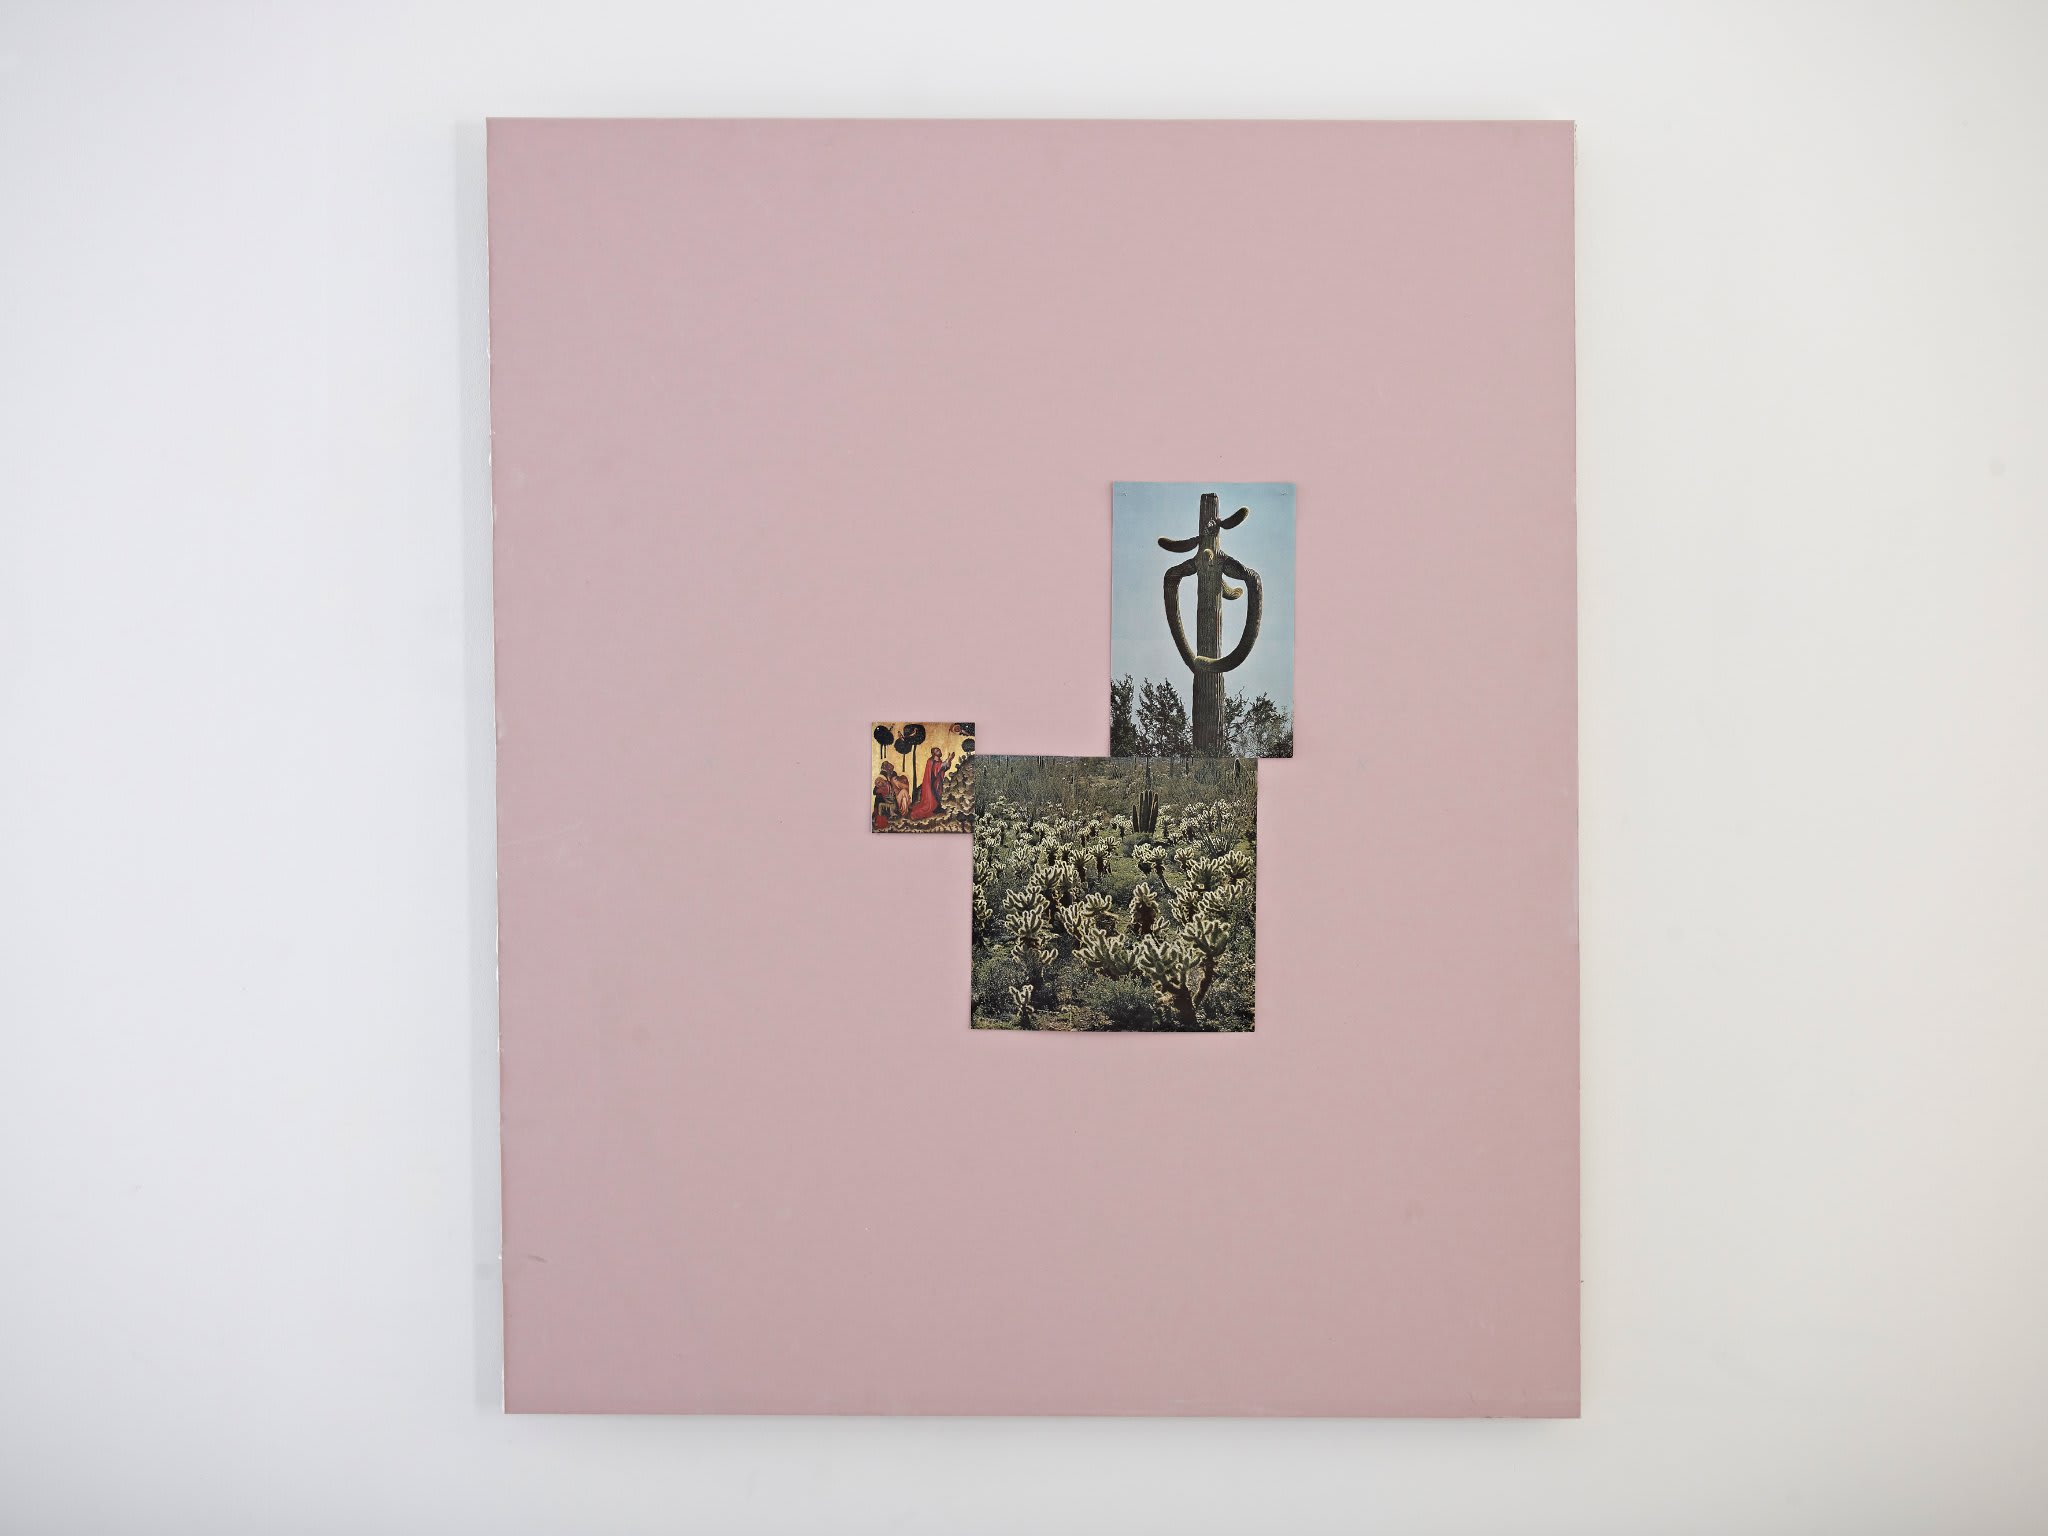 <span class=&#34;link fancybox-details-link&#34;><a href=&#34;/artists/16-paul-merrick/works/8248/&#34;>View Detail Page</a></span><div class=&#34;artist&#34;><strong>Paul Merrick</strong></div> <div class=&#34;title&#34;><em>Untitled (Cacti God)</em>, 2013</div> <div class=&#34;medium&#34;>Fire proof plasterboard, found image, dressmaker pins</div> <div class=&#34;dimensions&#34;>100 x 120 cm<br />39 3/8 x 47 1/4 in</div><div class=&#34;copyright_line&#34;>Copyright The Artist</div>